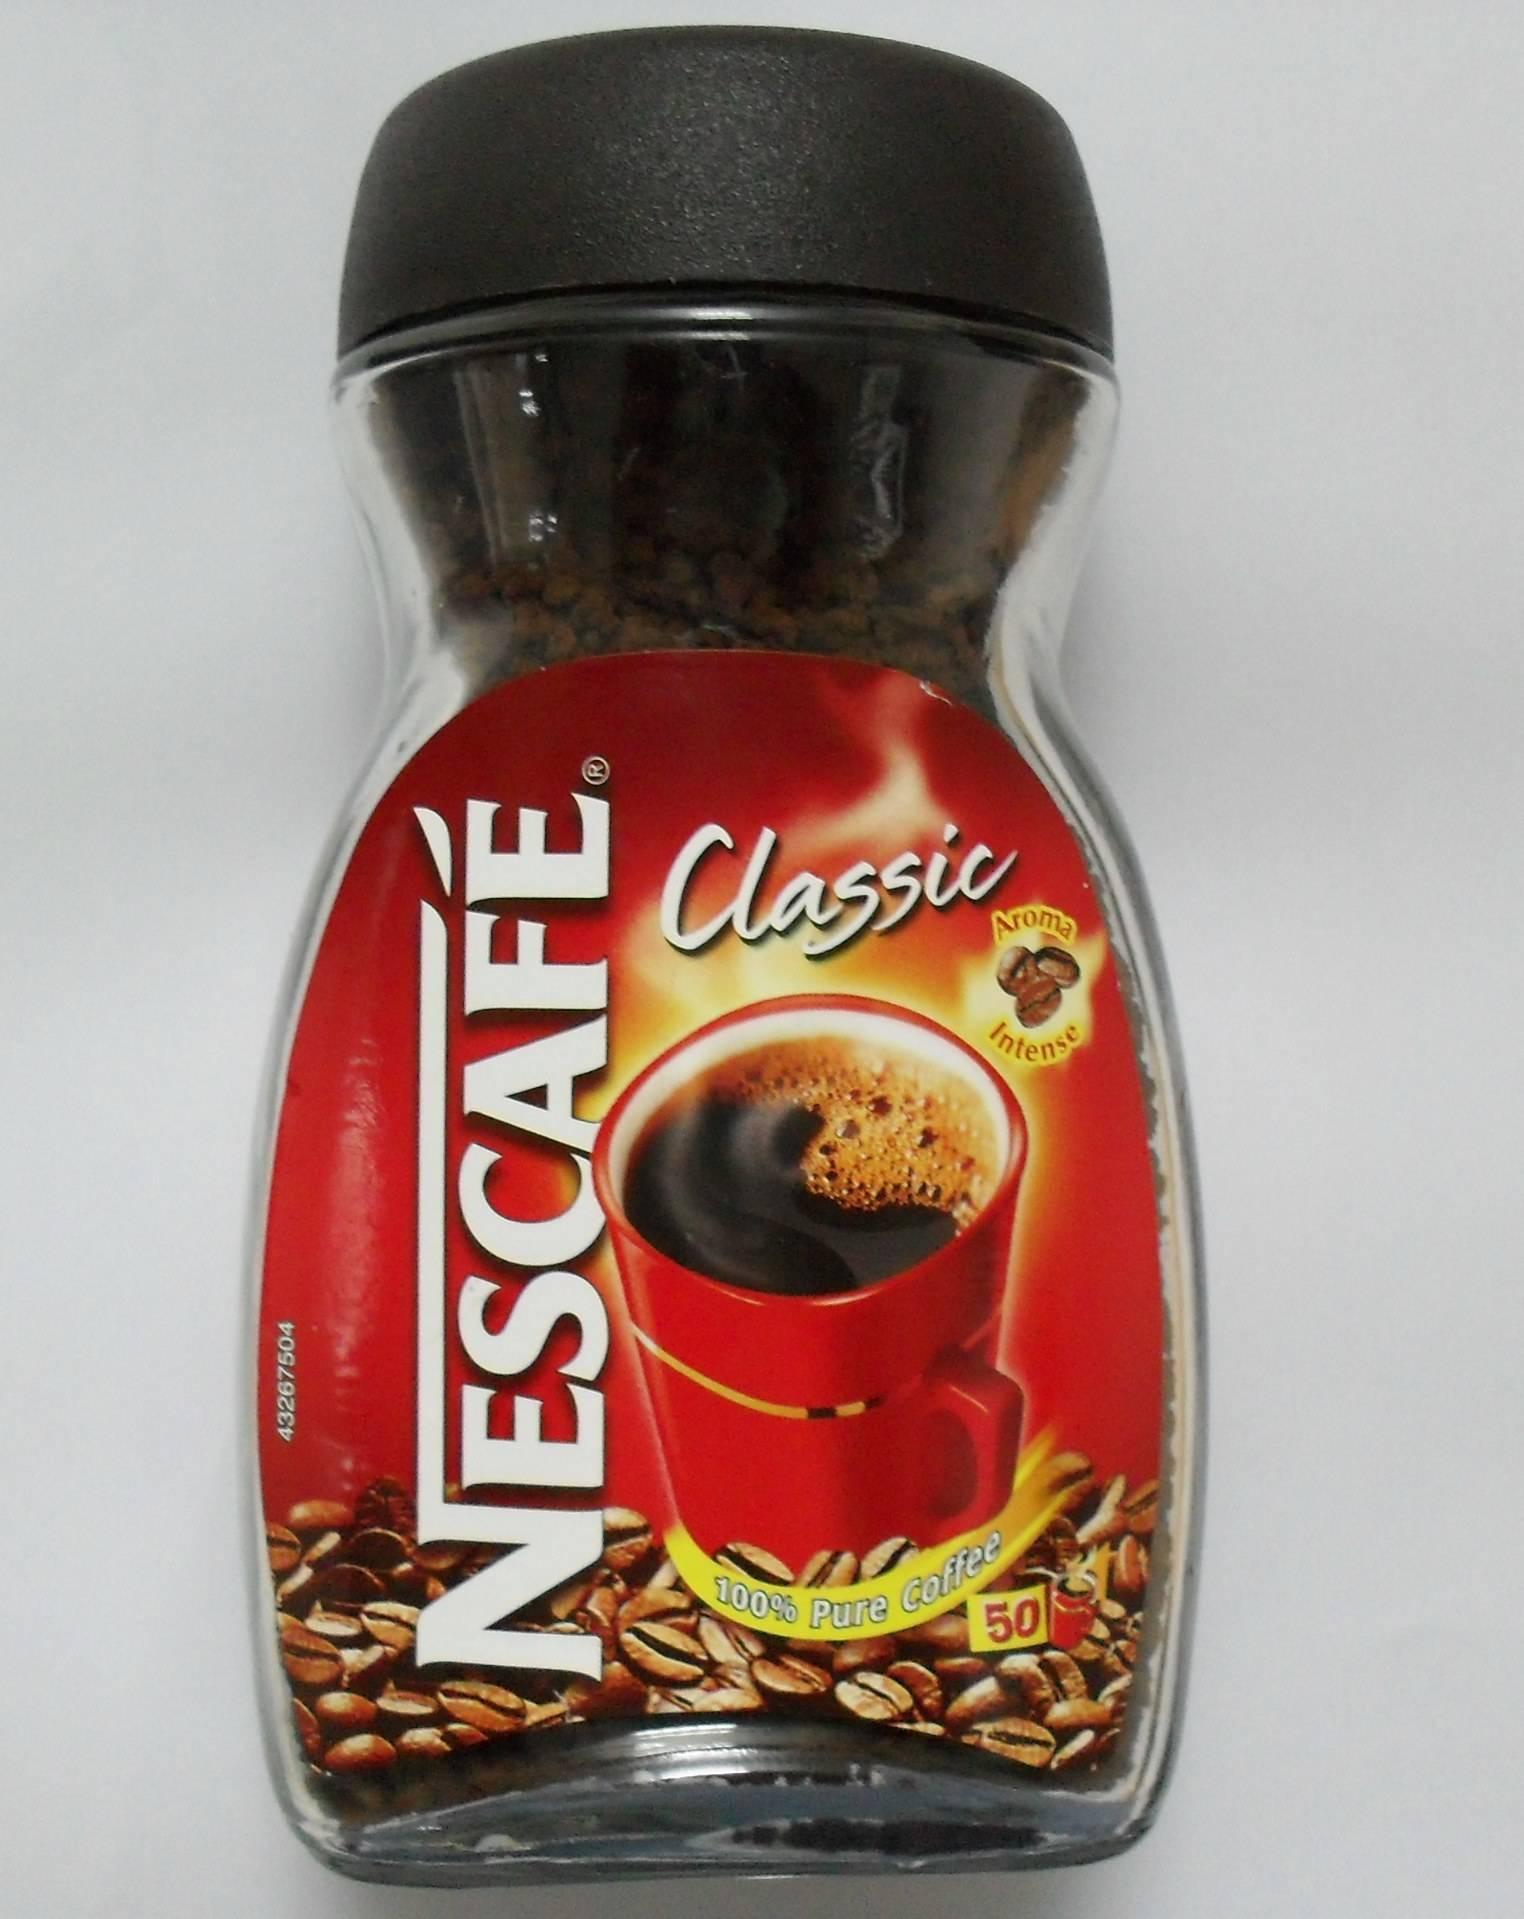 Nescafe Instant coffee & Carnation coffeemate.